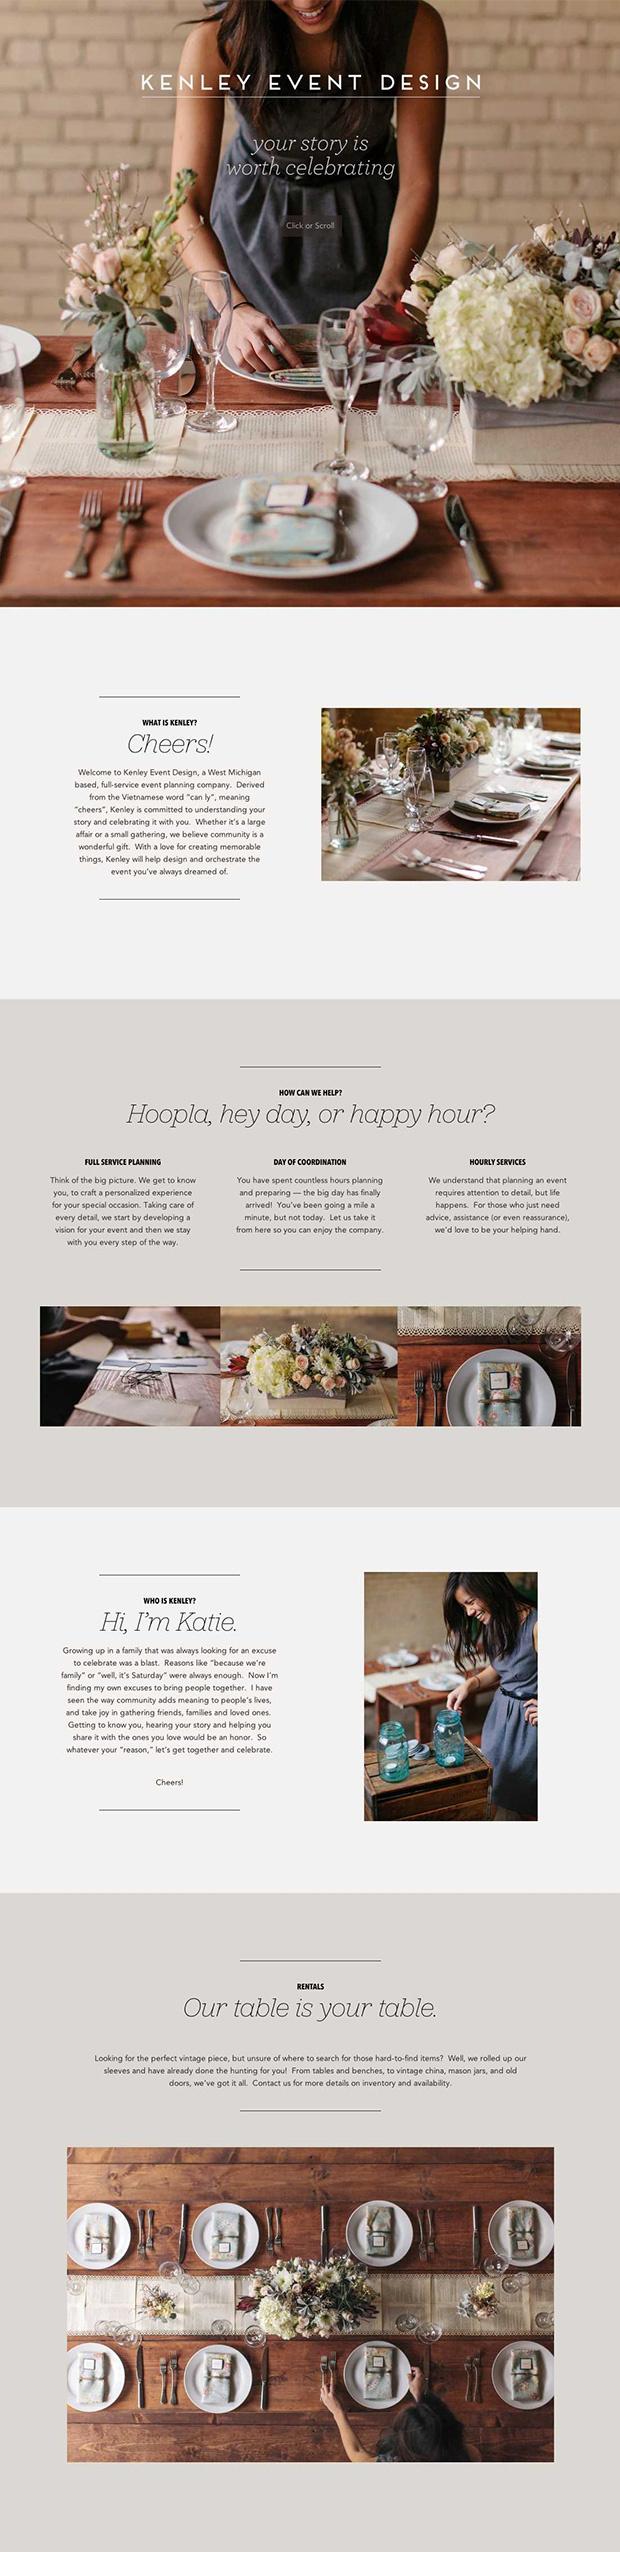 Kenley-Event-Design